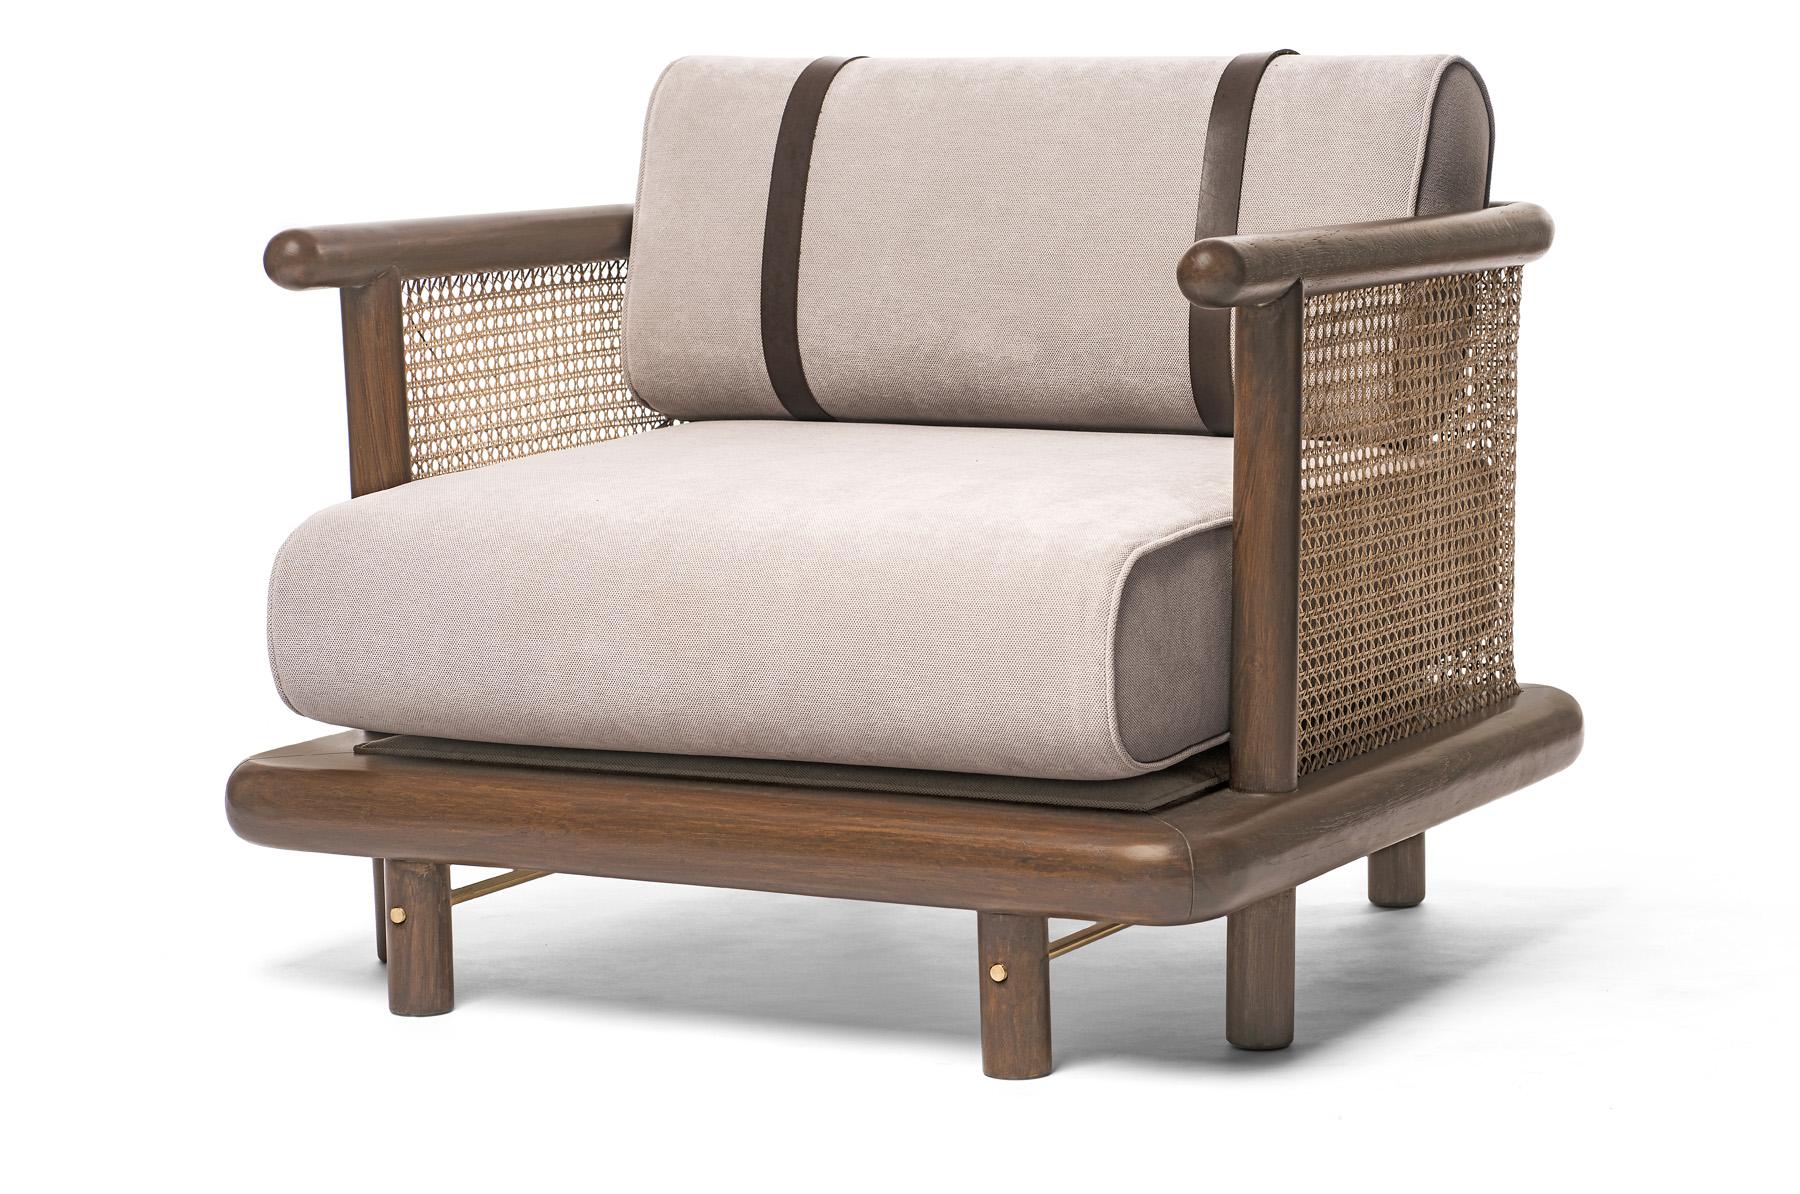 Bethak Single Seater Sofa.jpg